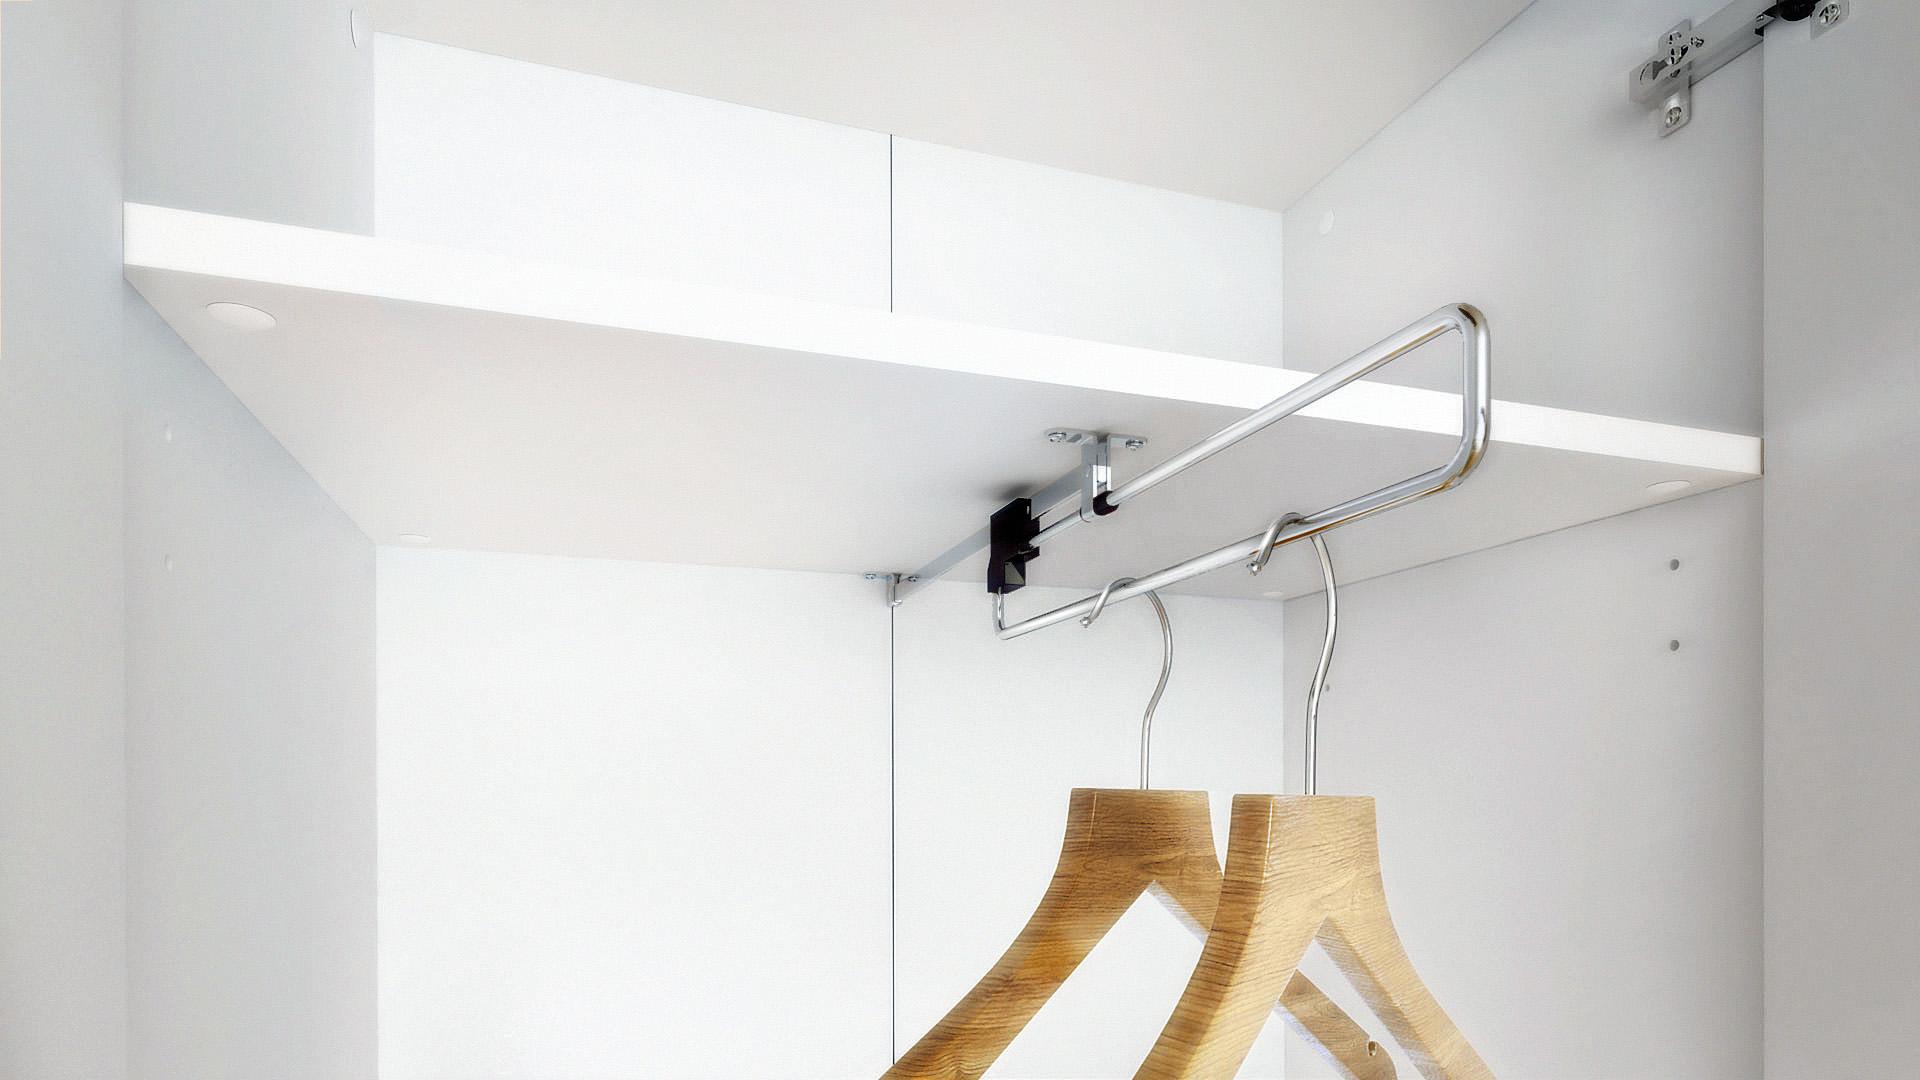 garderobenschrank flur dielenschrank moravia wei hochglanz matt naturt ne ebay. Black Bedroom Furniture Sets. Home Design Ideas